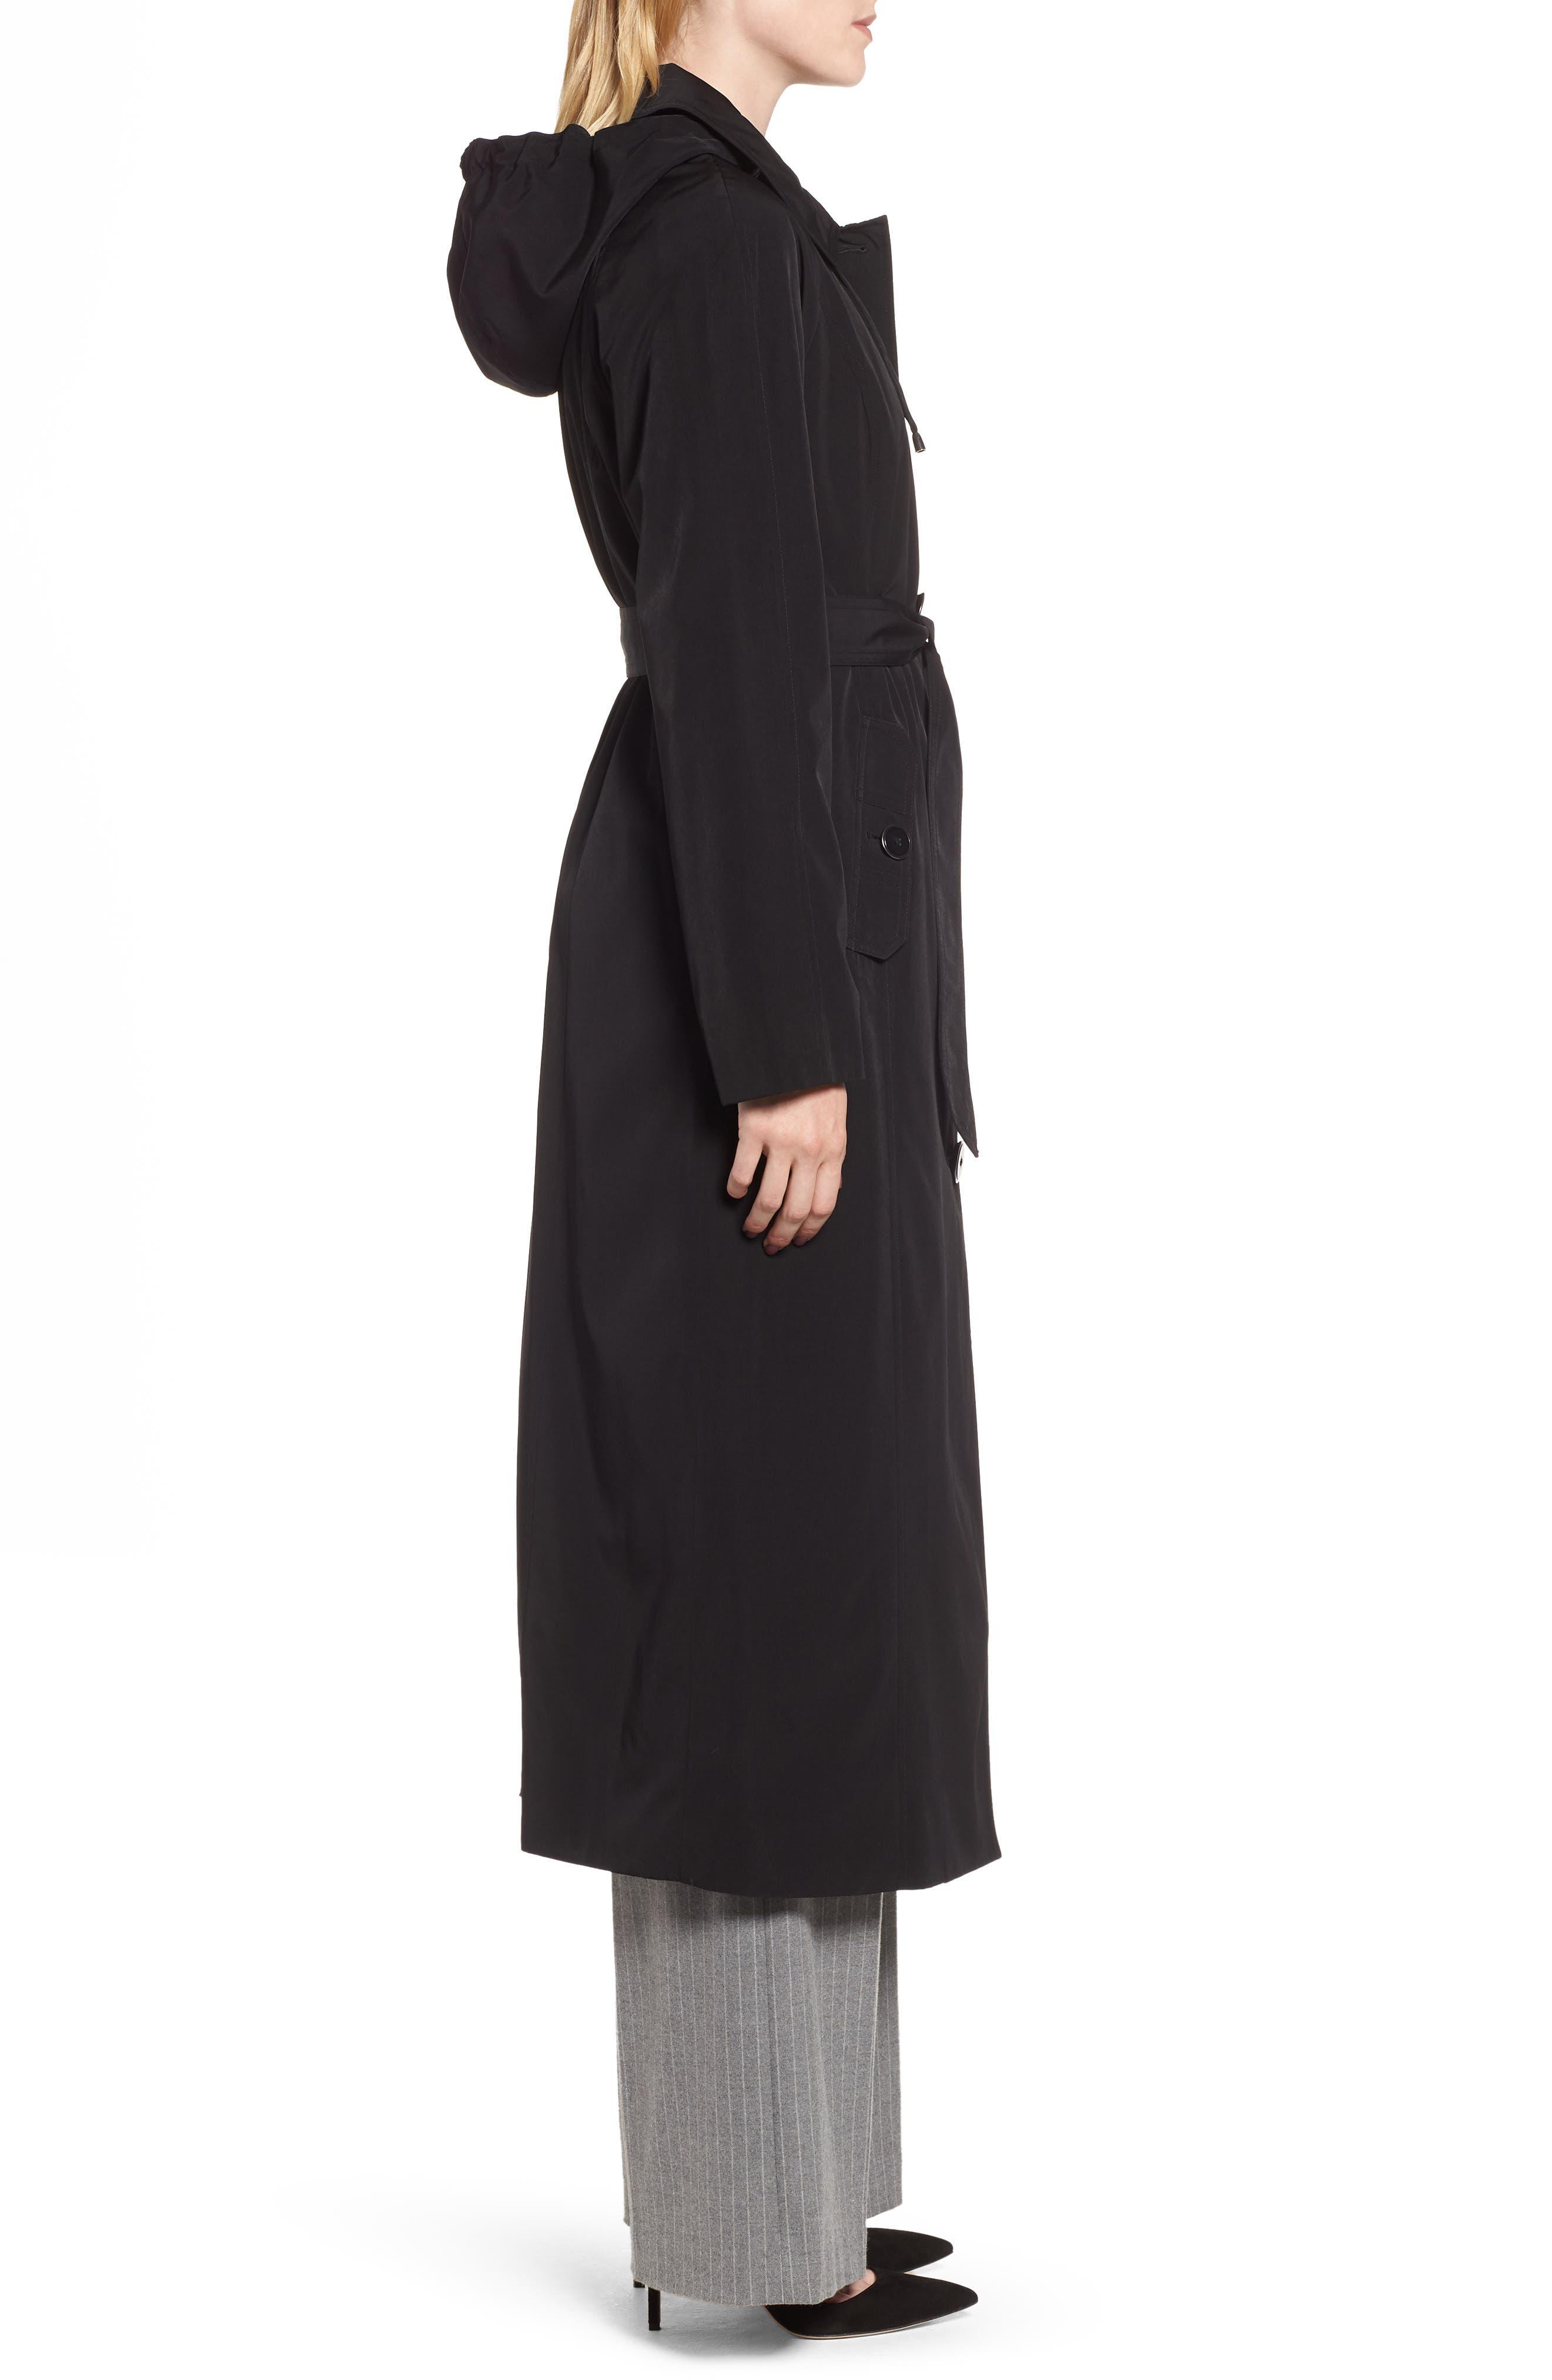 LONDON FOG, Long Trench Coat with Detachable Hood & Liner, Alternate thumbnail 4, color, BLACK